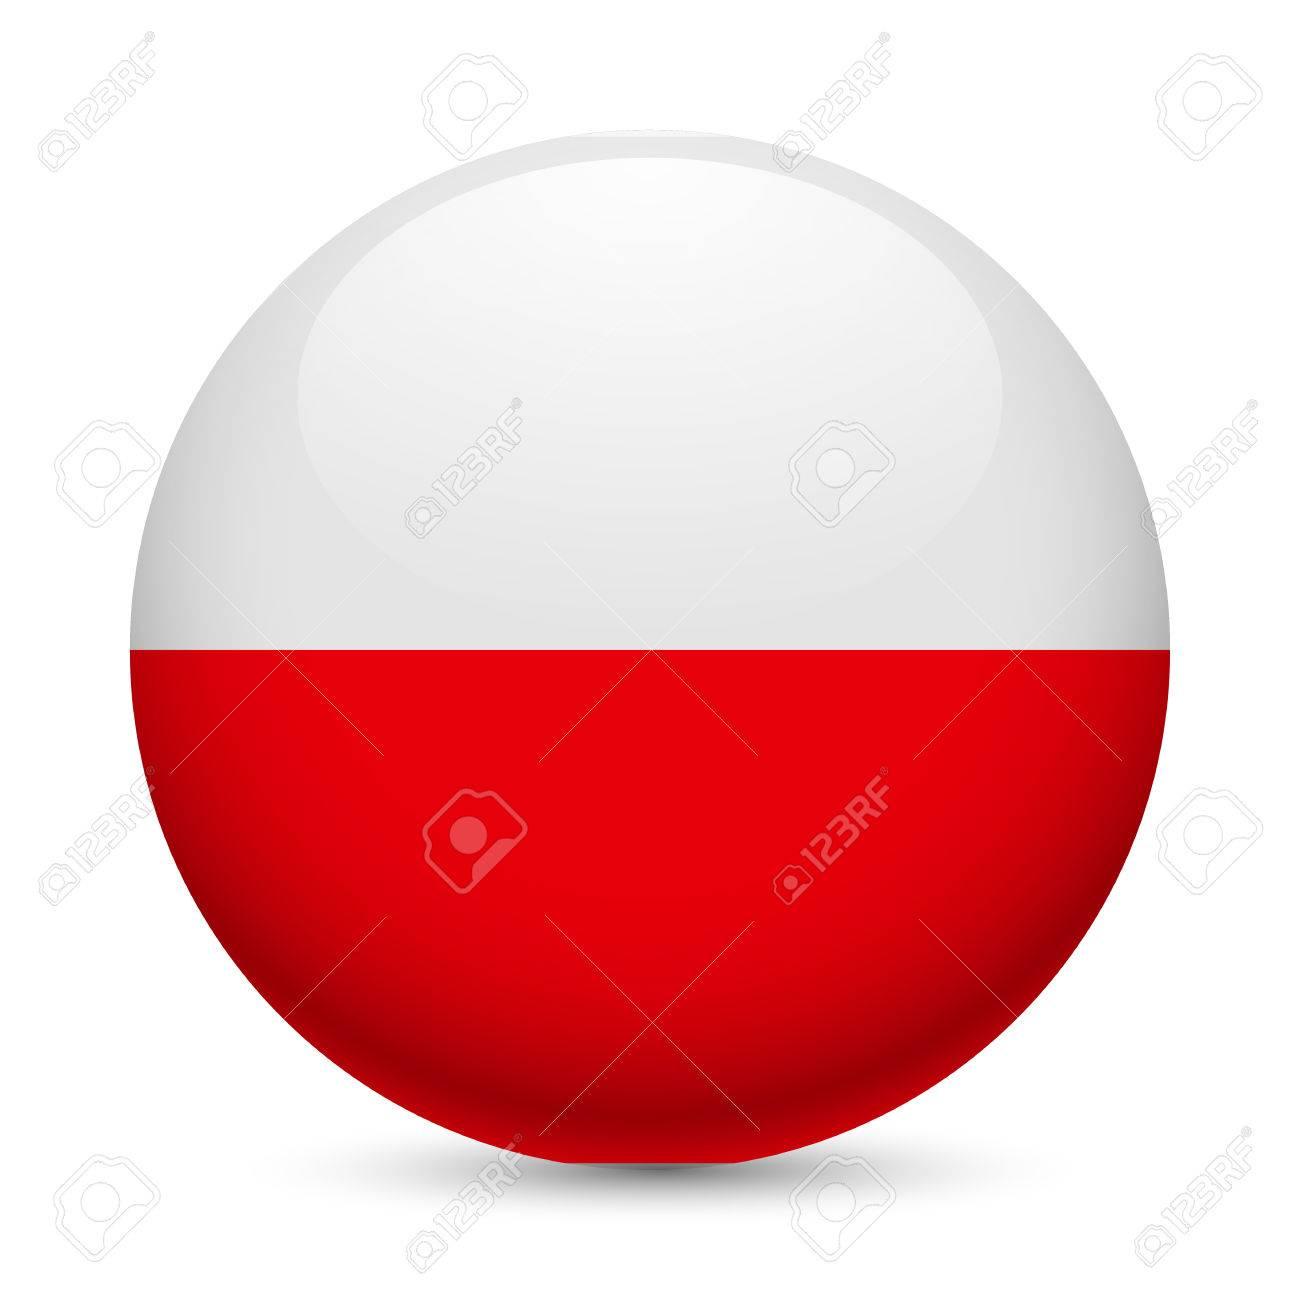 flag of poland as round glossy icon button with polish flag